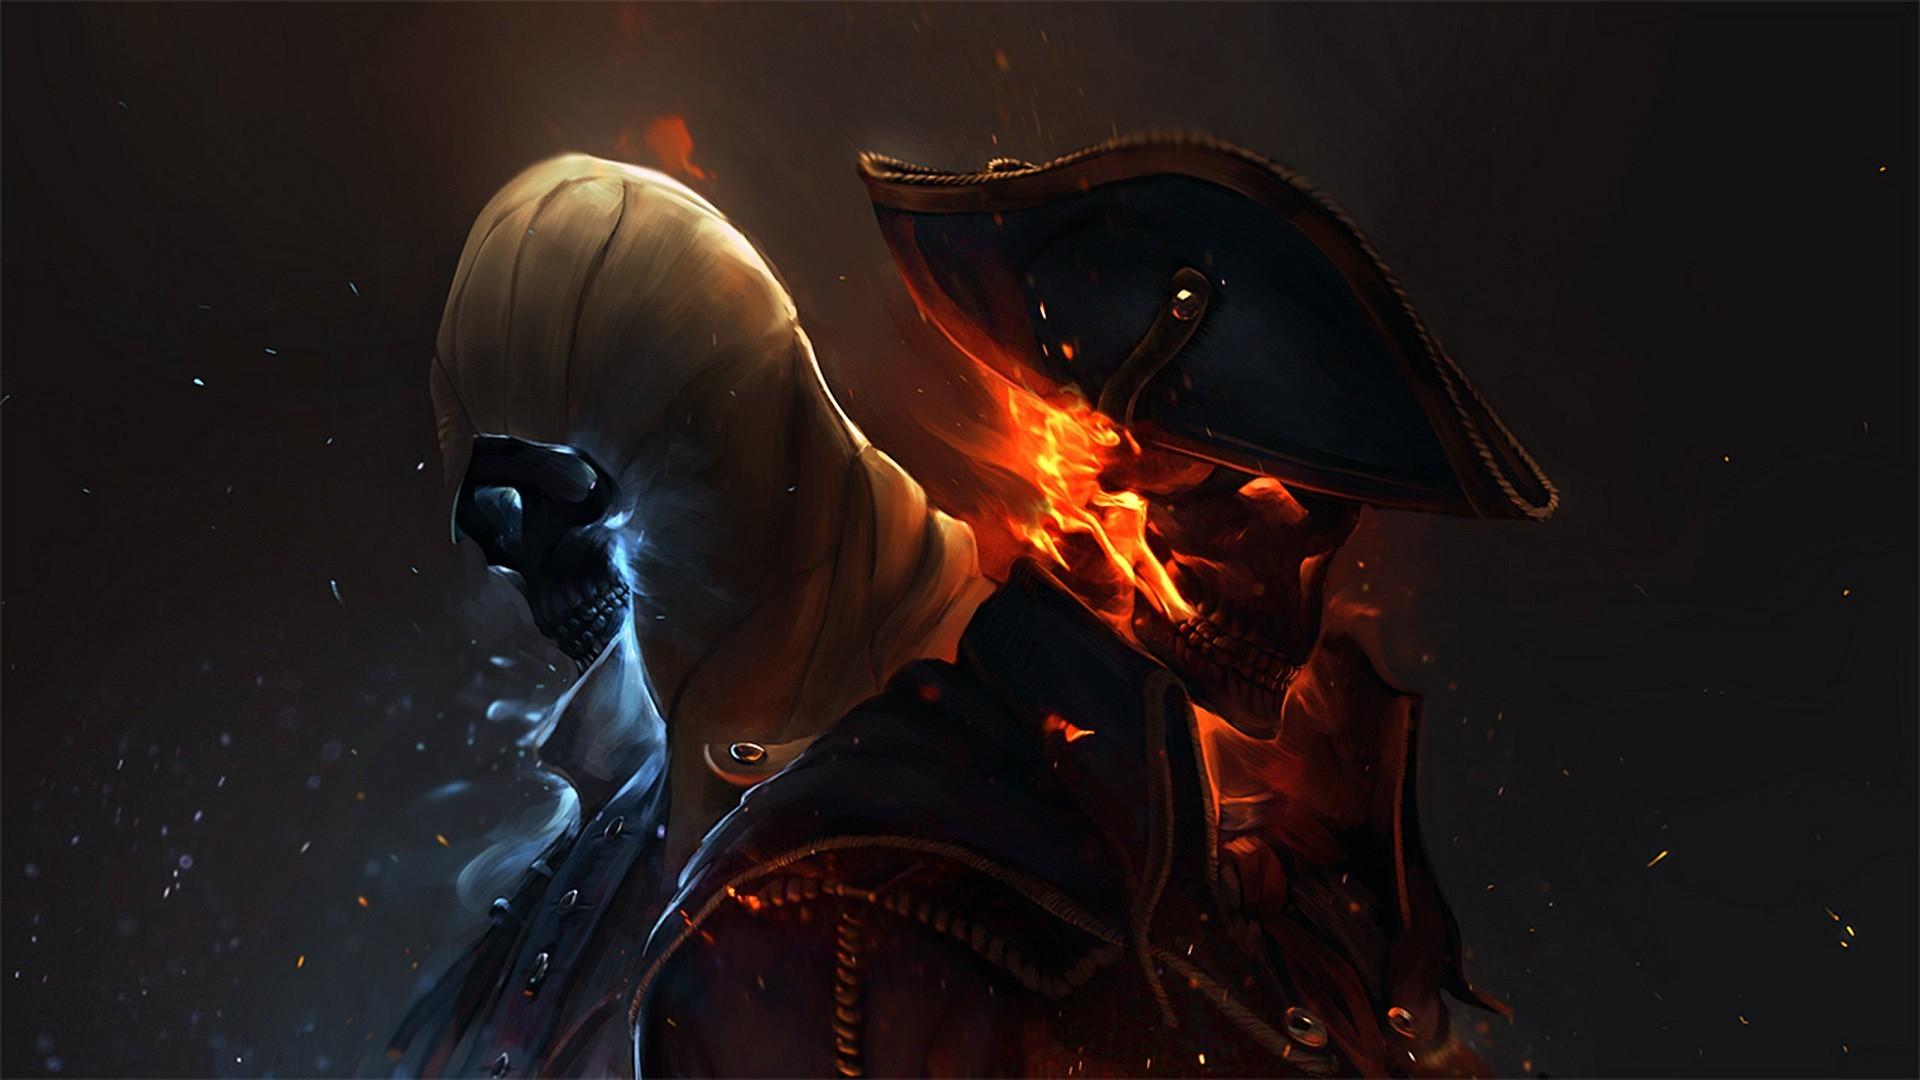 Assassin's Creed 4 Black Flag wallpaper – 934009